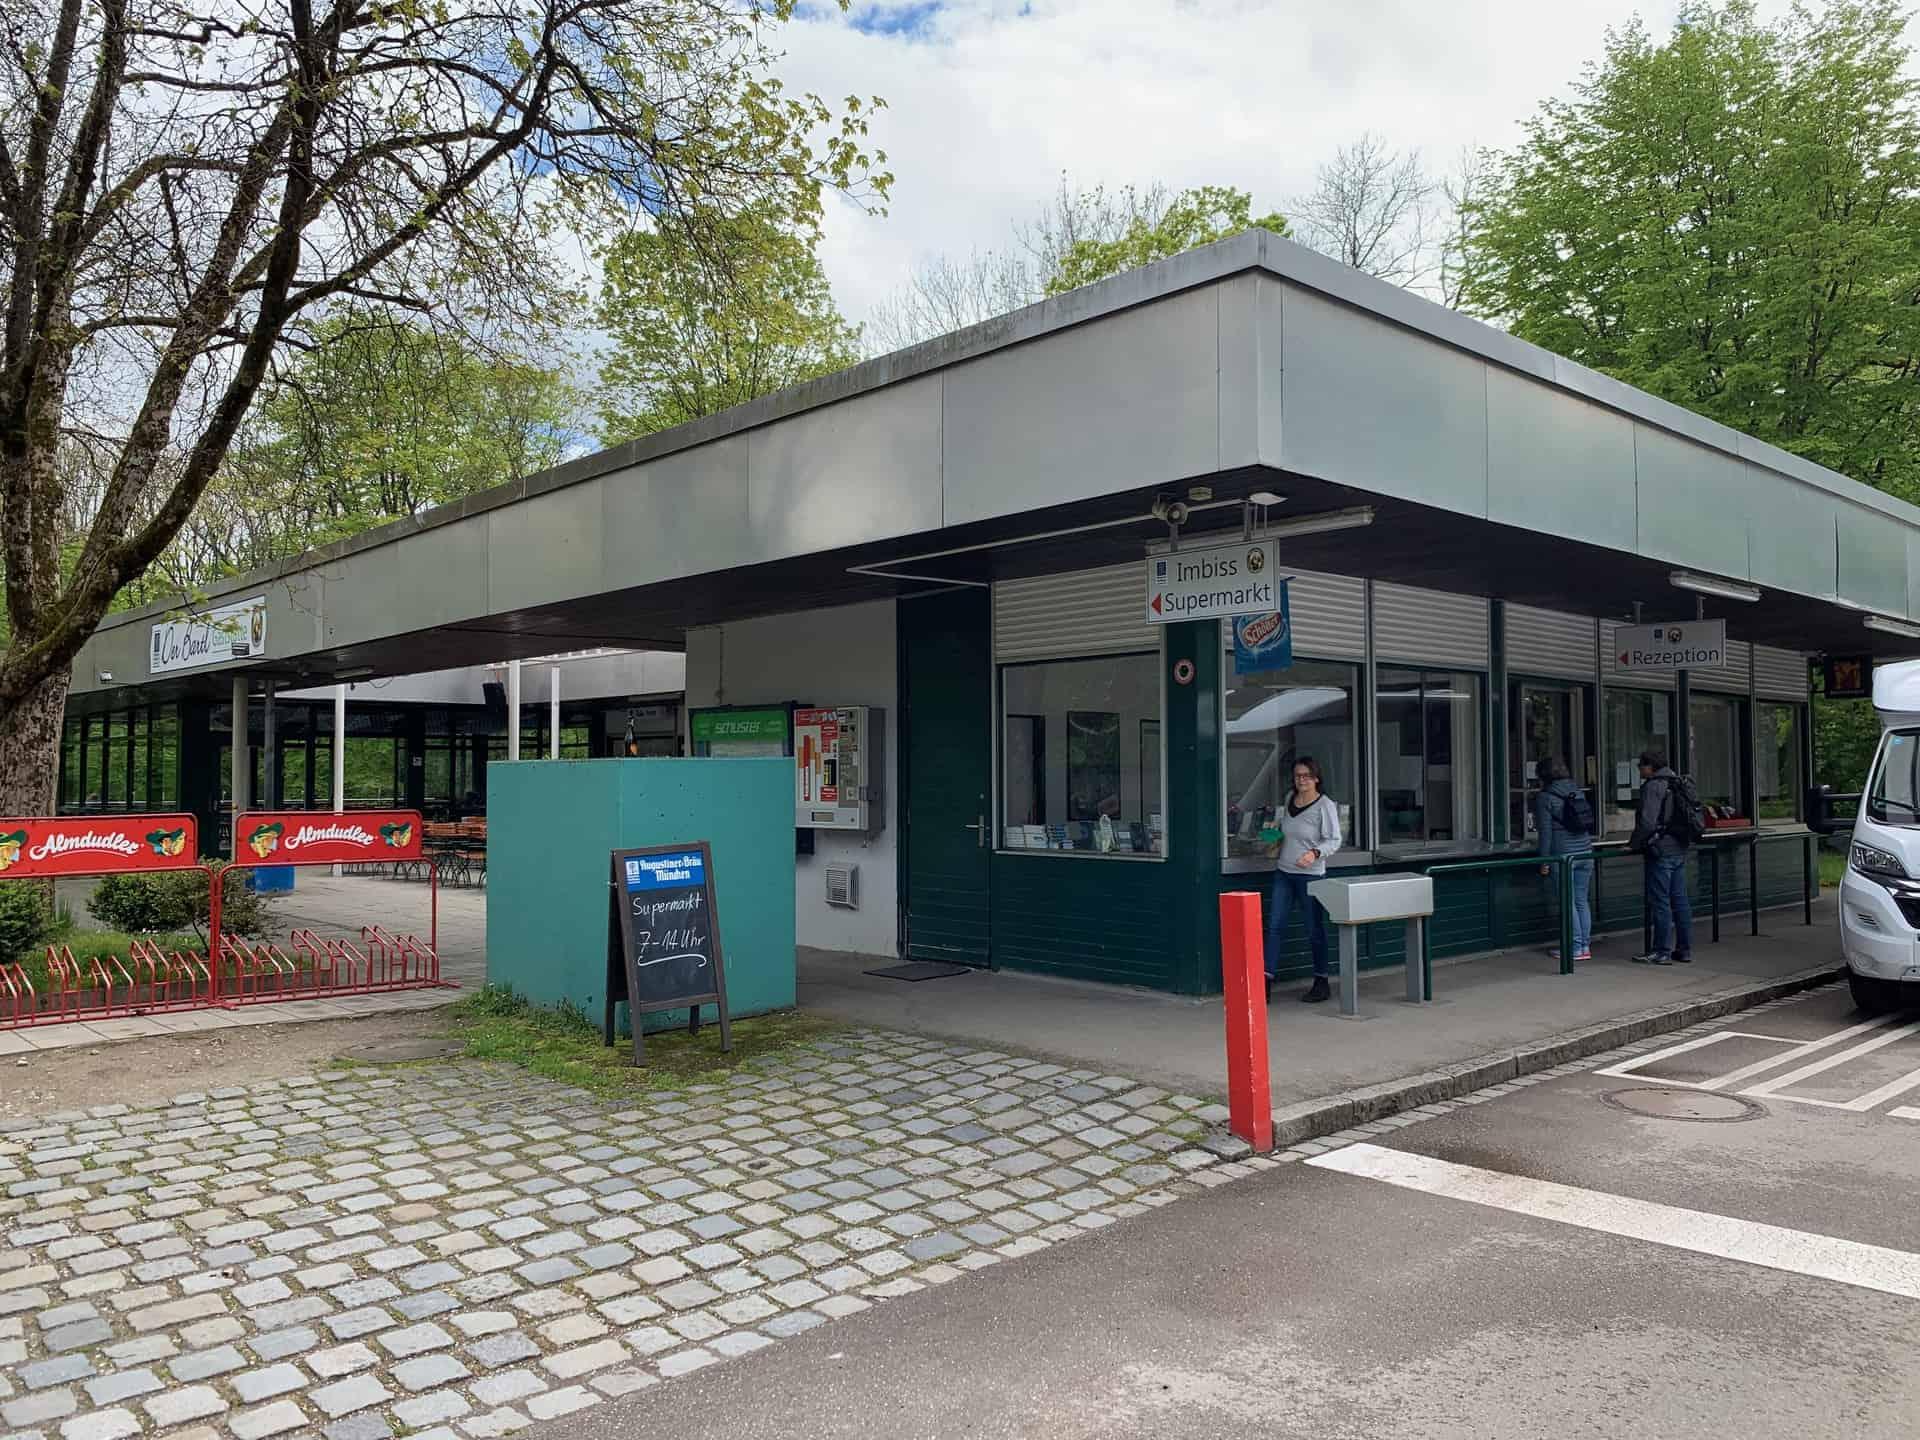 Campingplatz_München_Thalkirchen_Rezeption